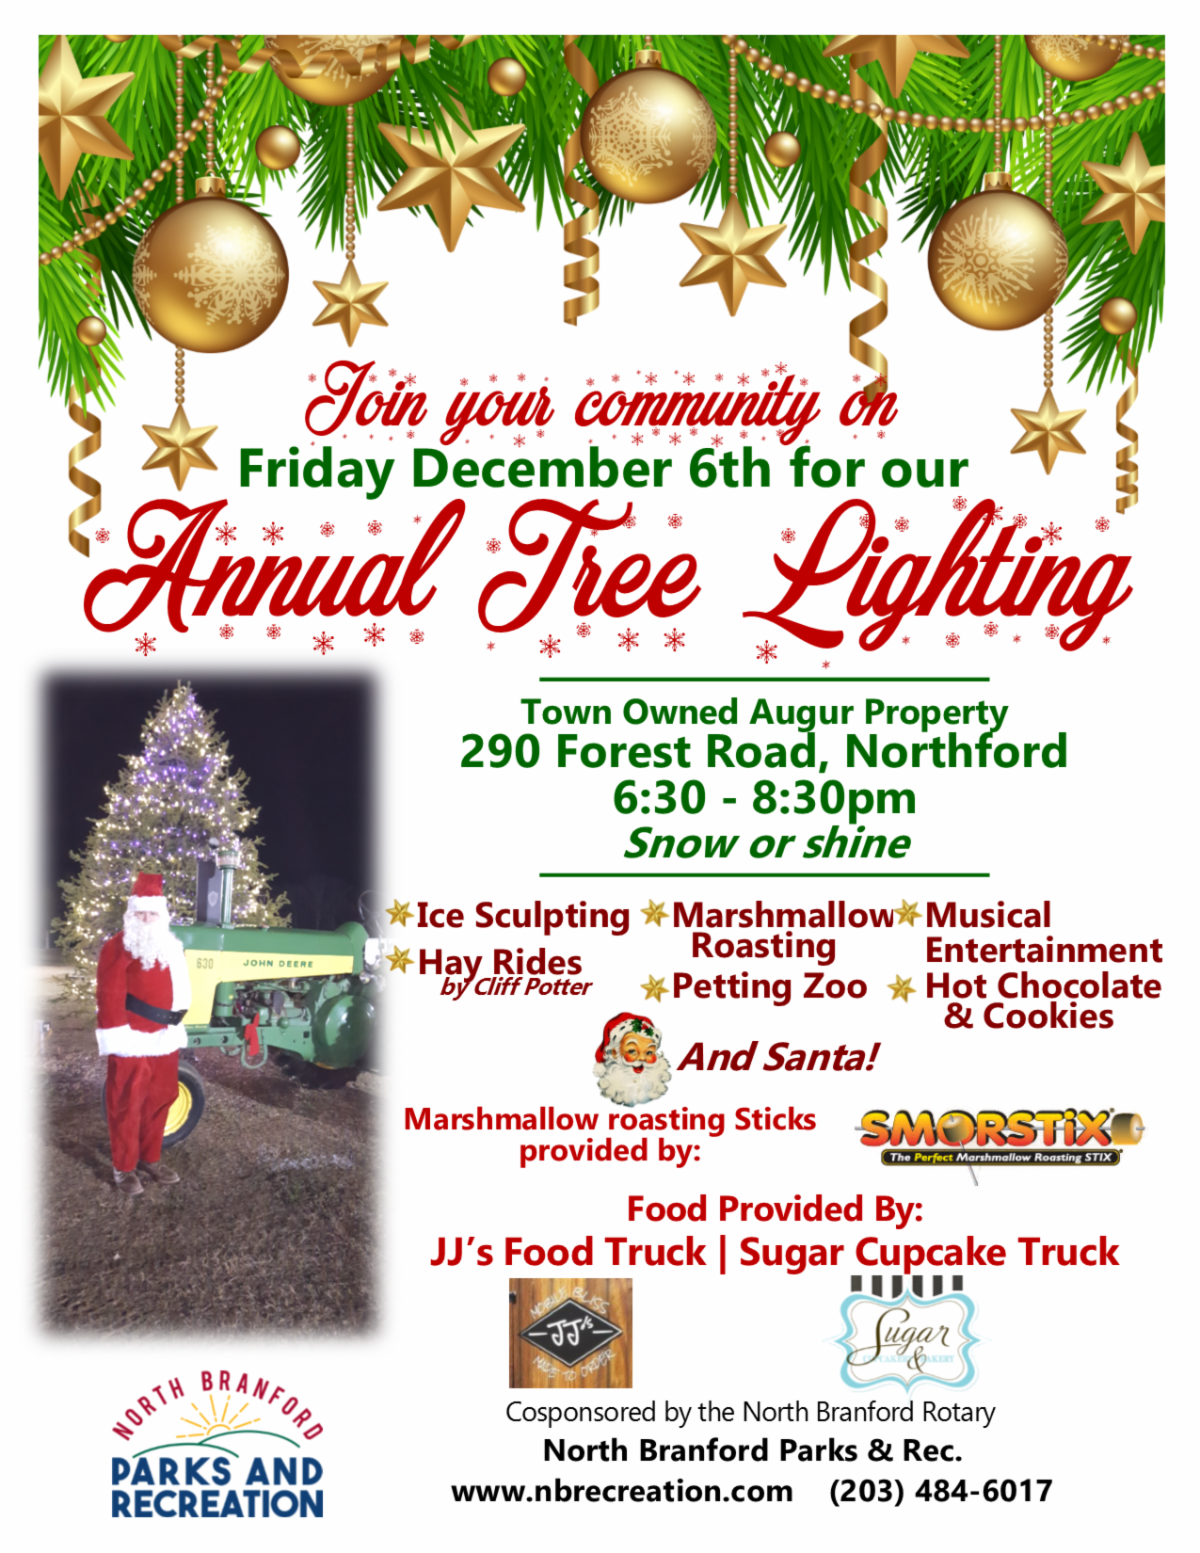 North Branford Tree Lighting